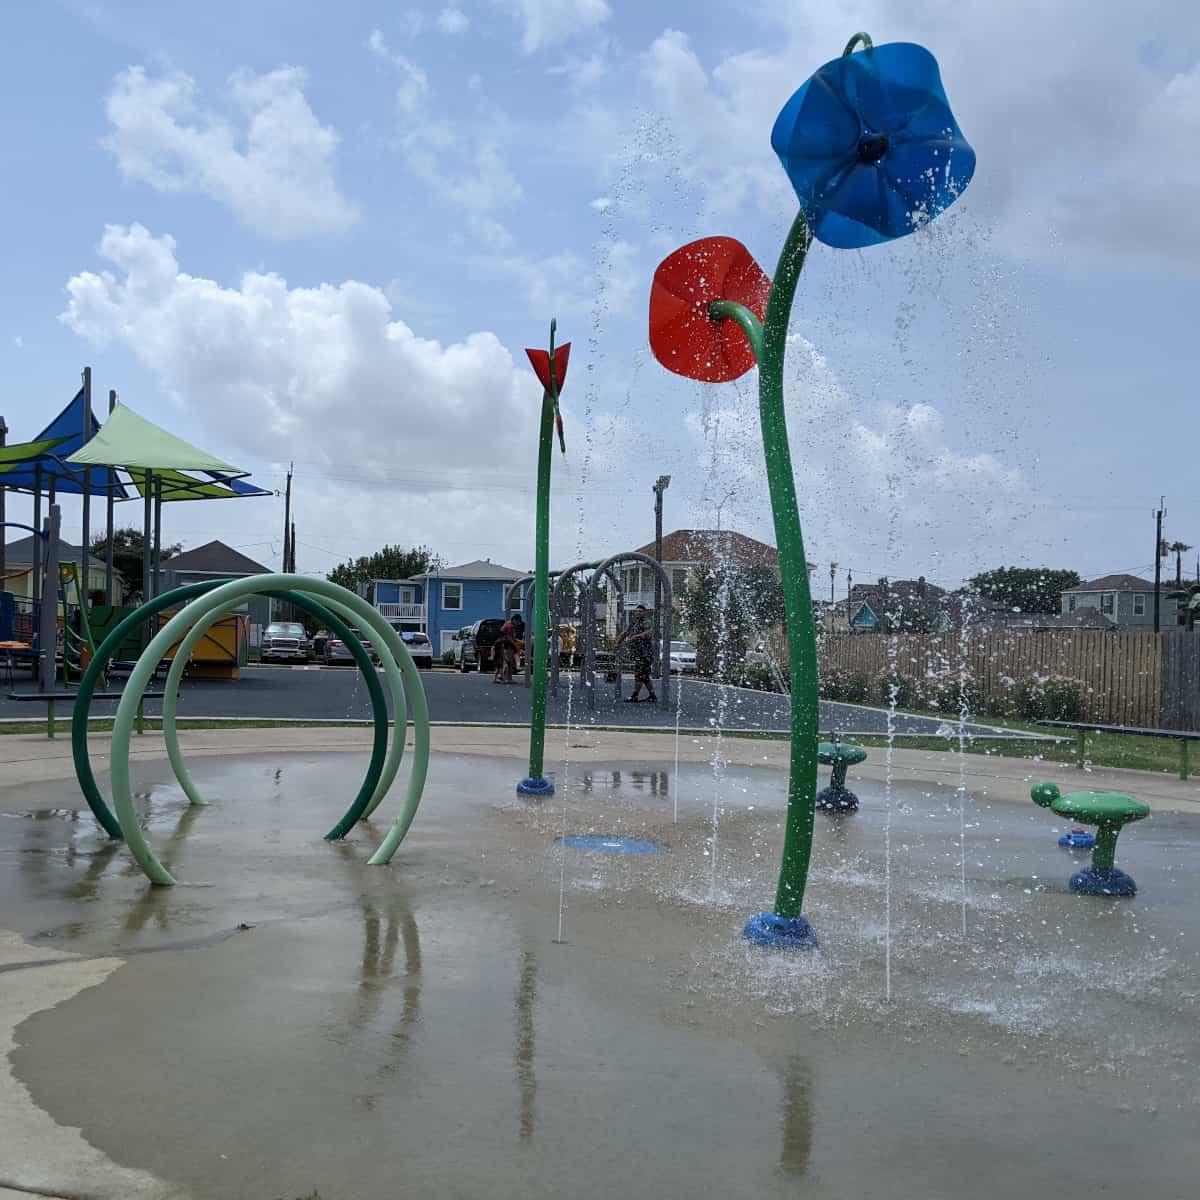 Menard Park Galveston Splashpad